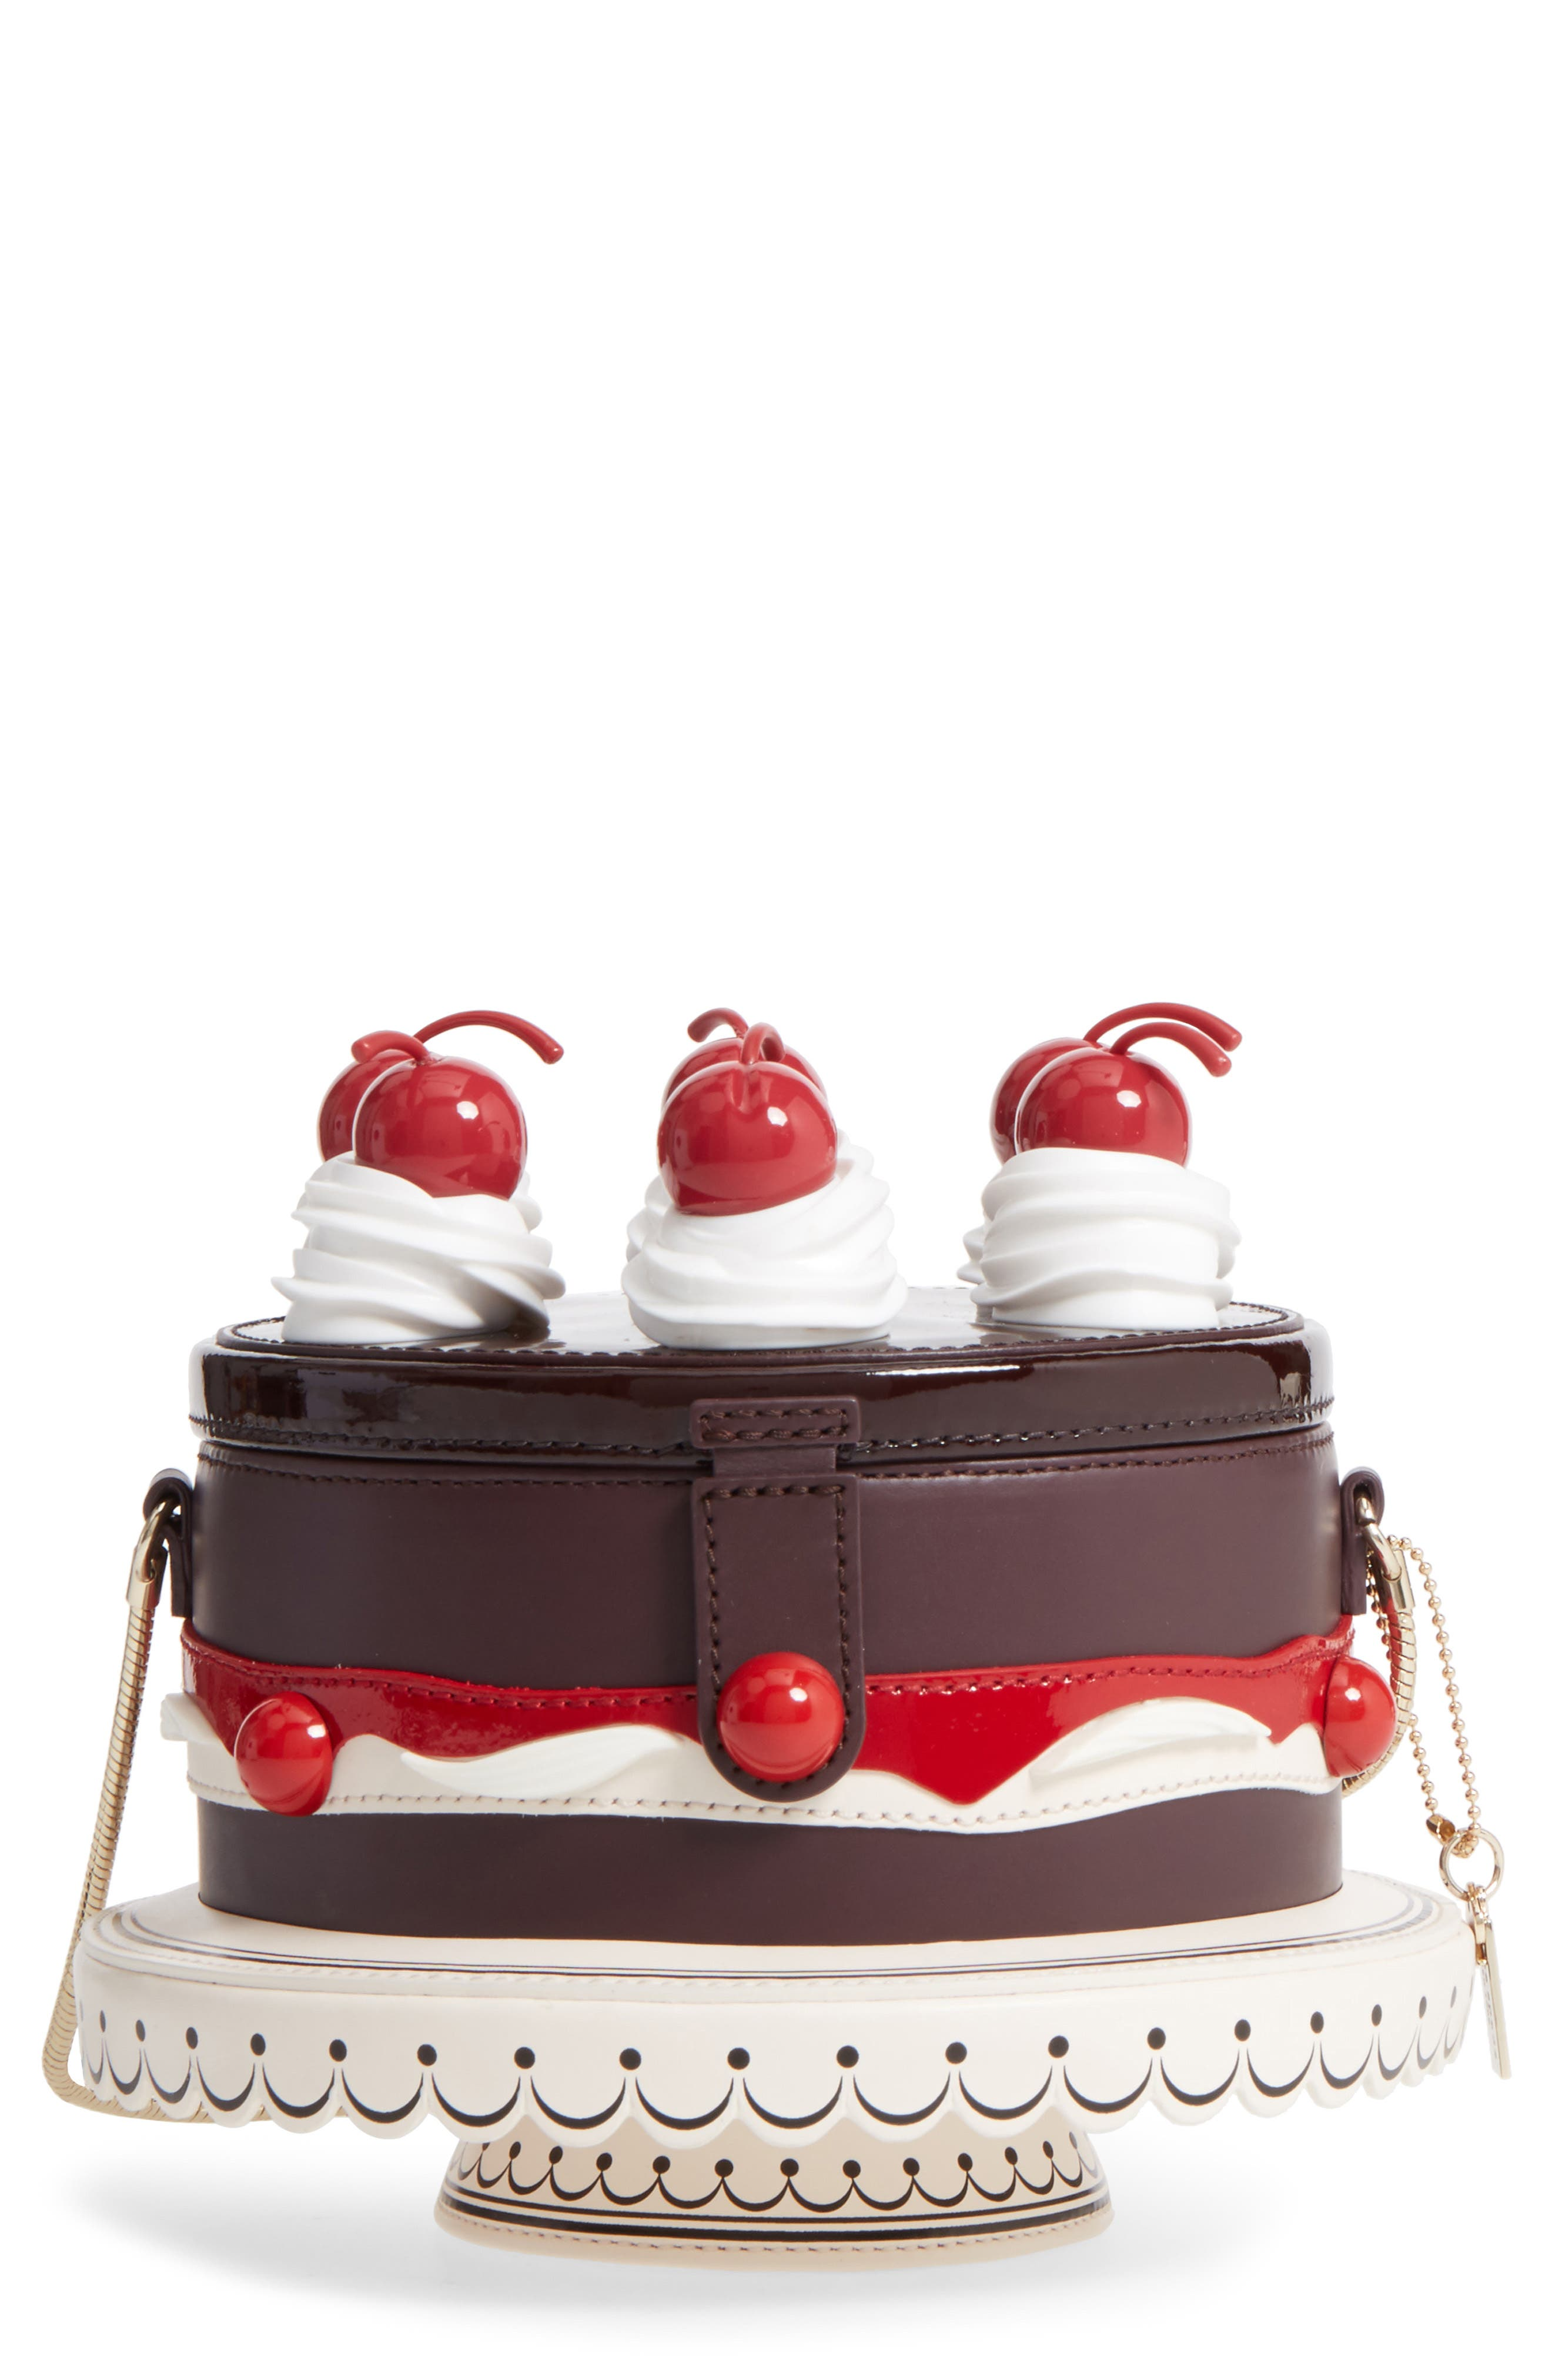 kate spade new york ma cherie - cherry cake leather shoulder bag